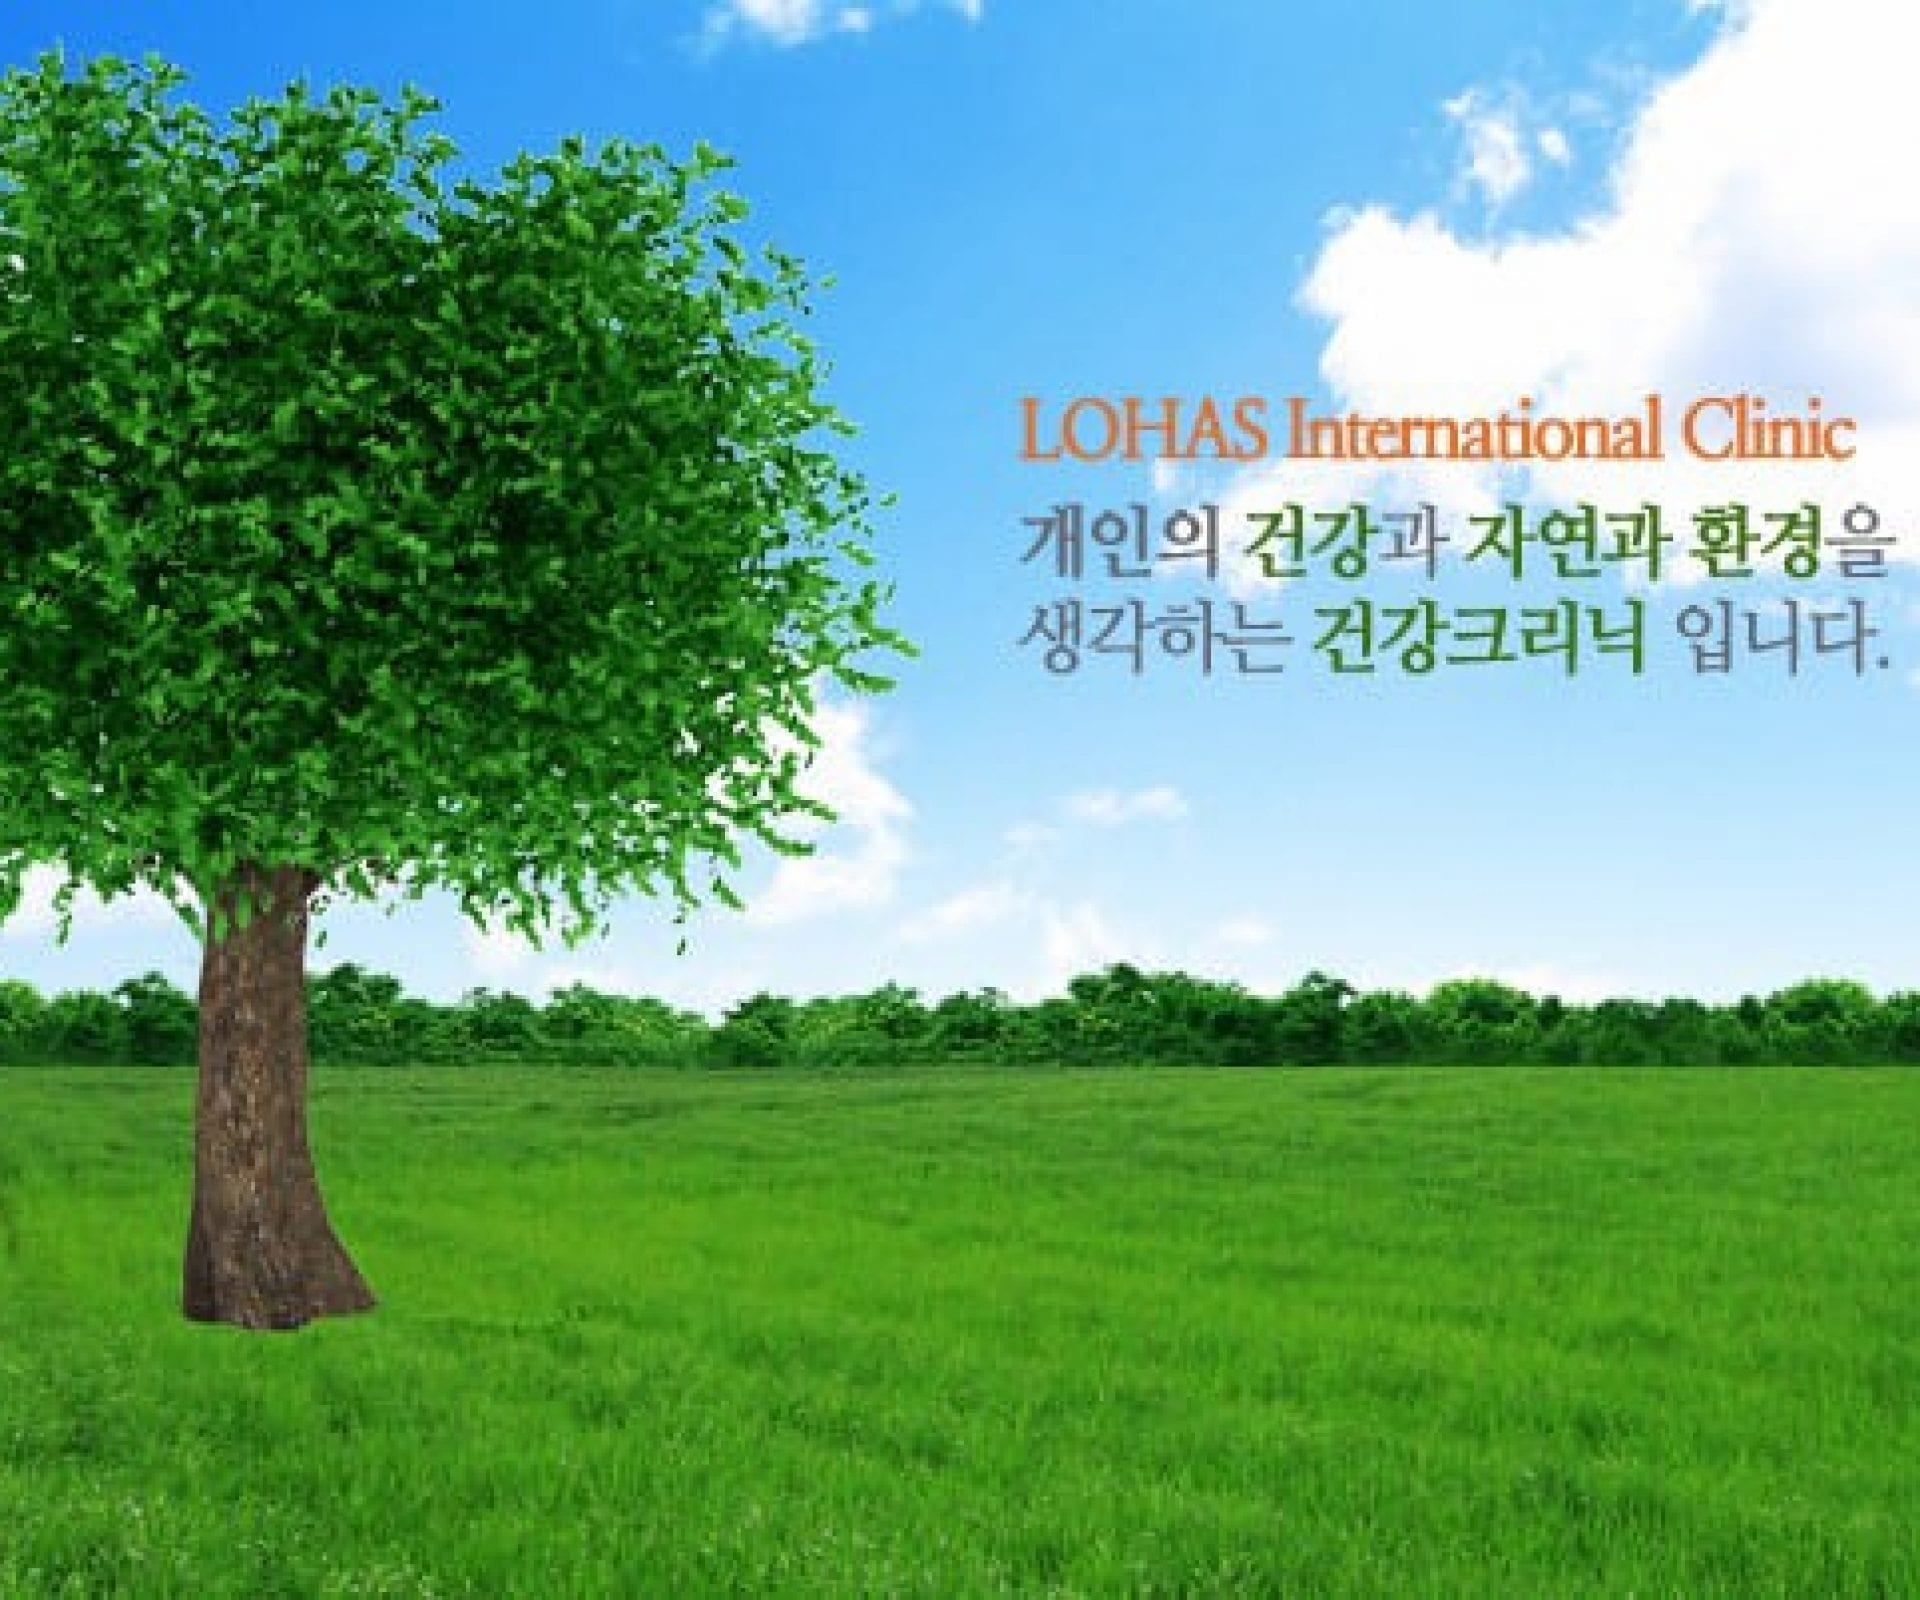 Lohas Care International Clinic | Yongsan-gu, Seoul